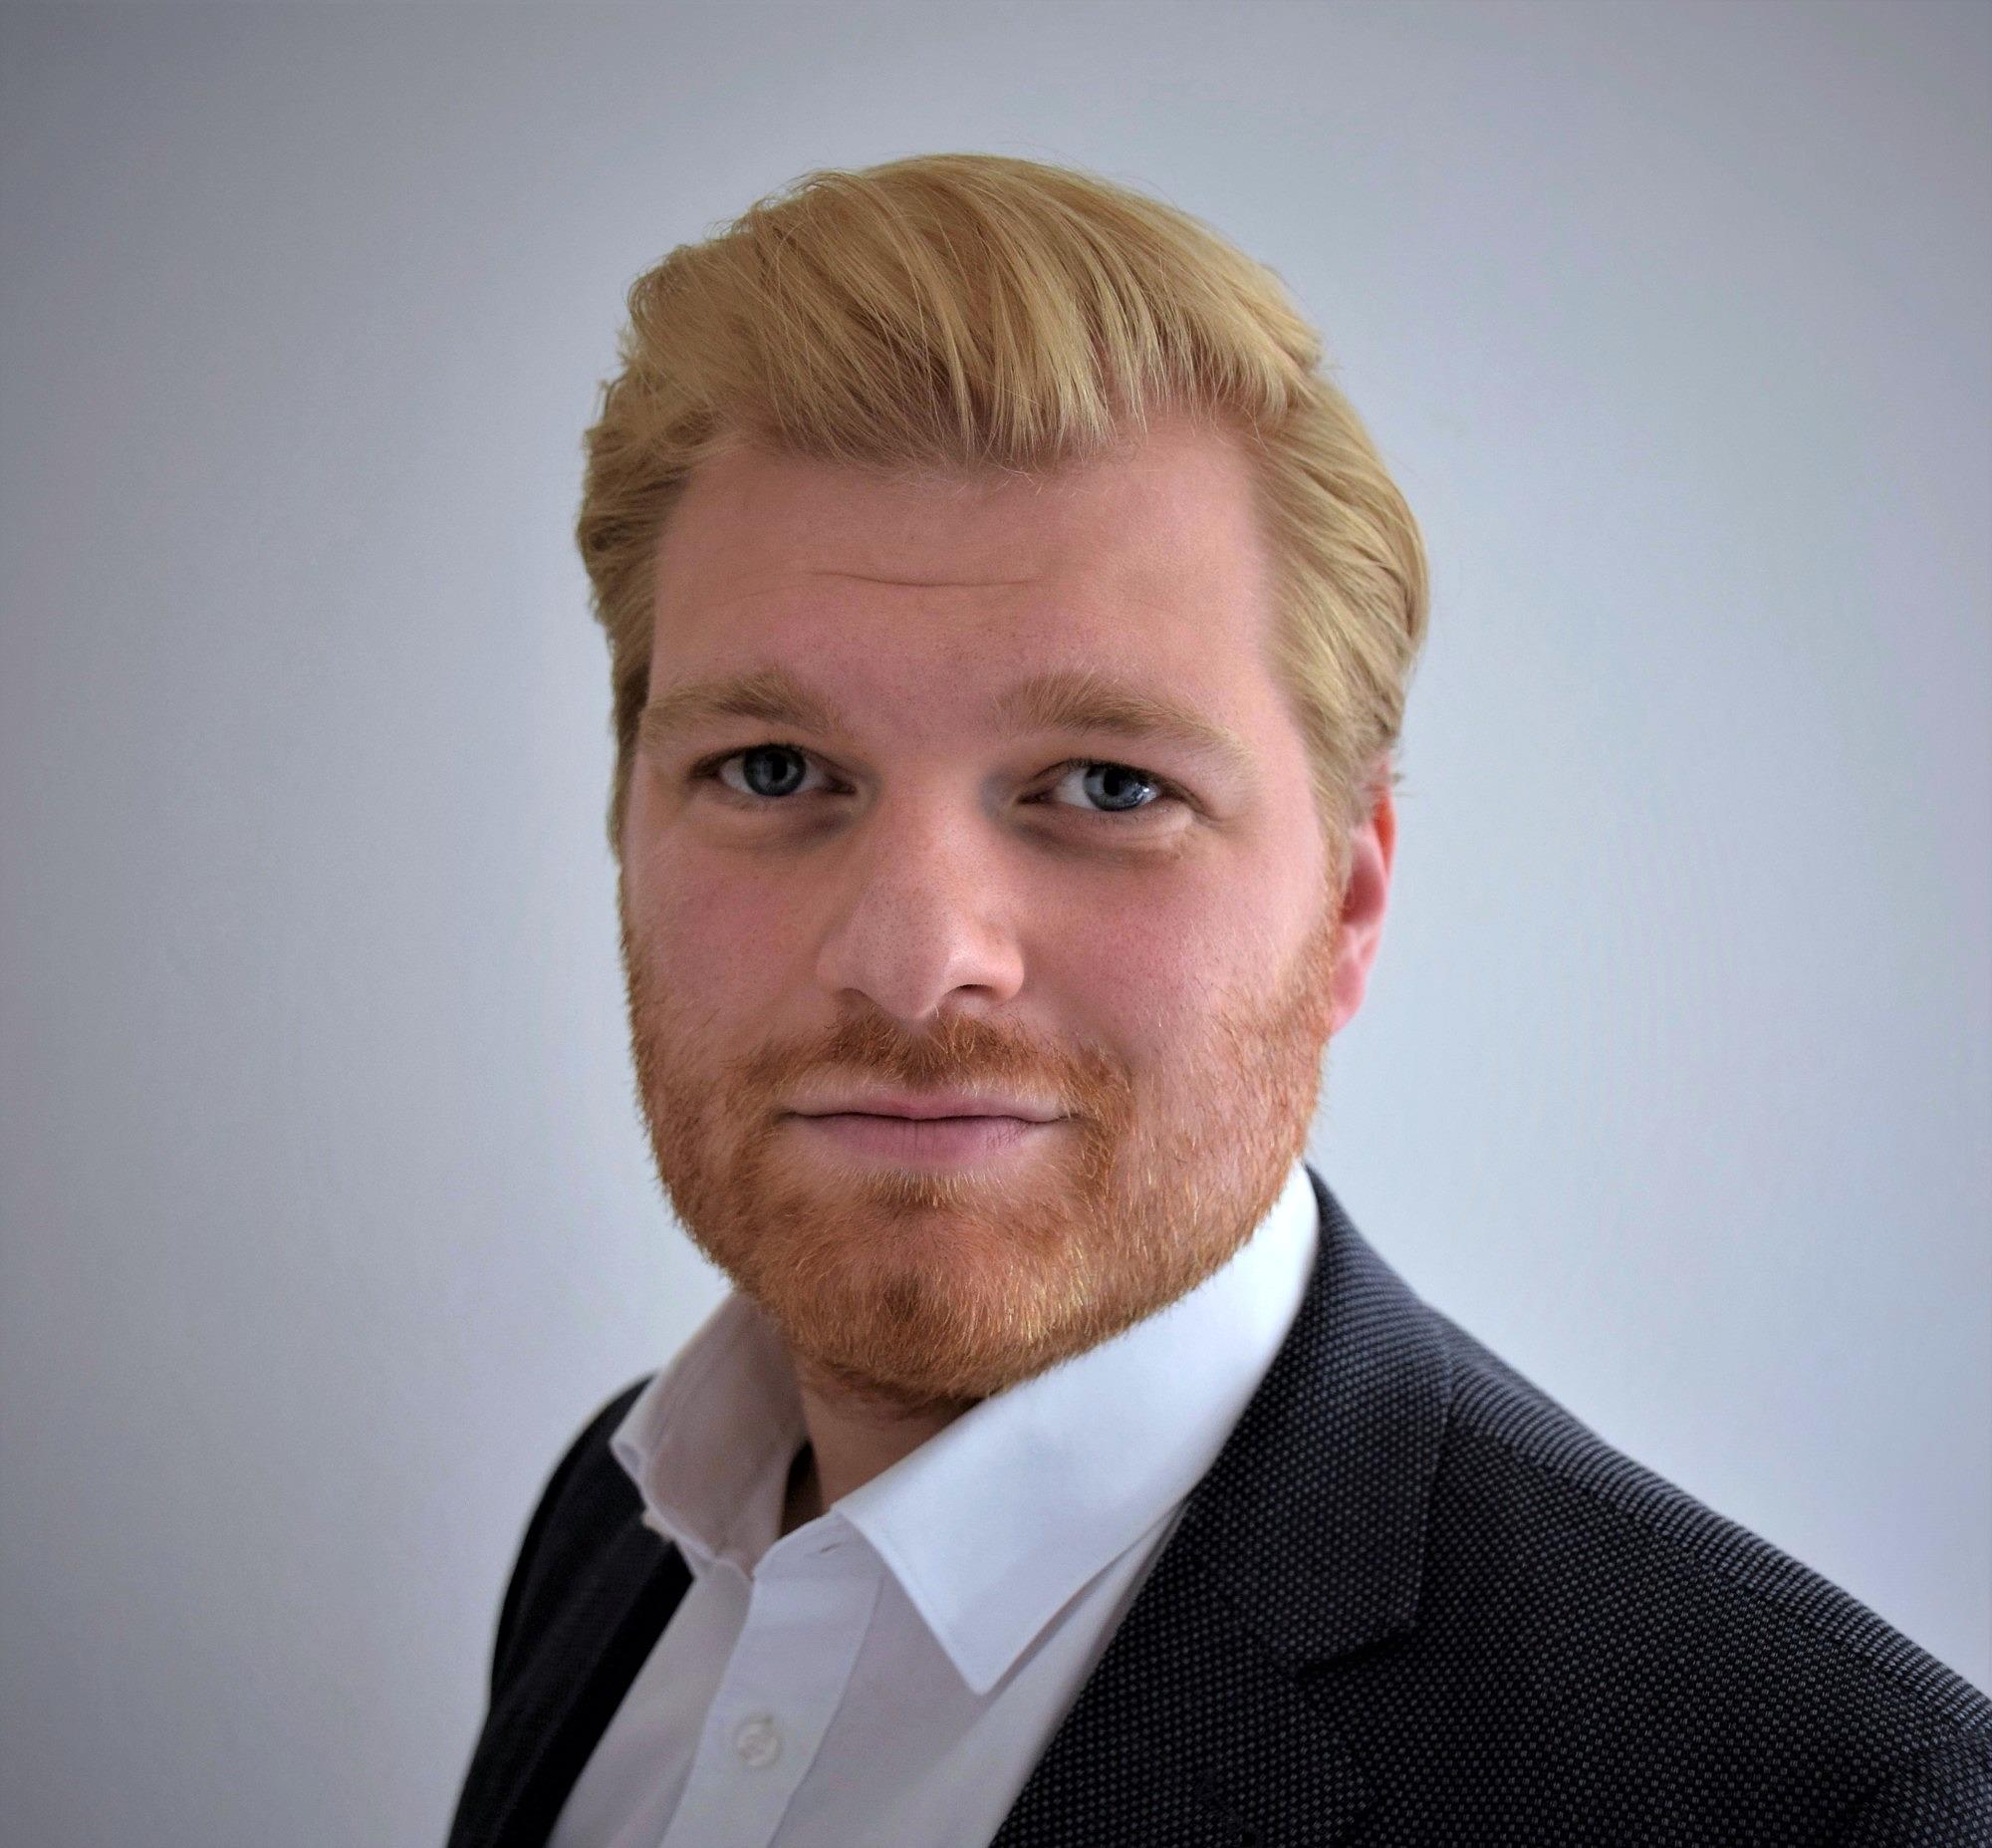 Florian Nicolai